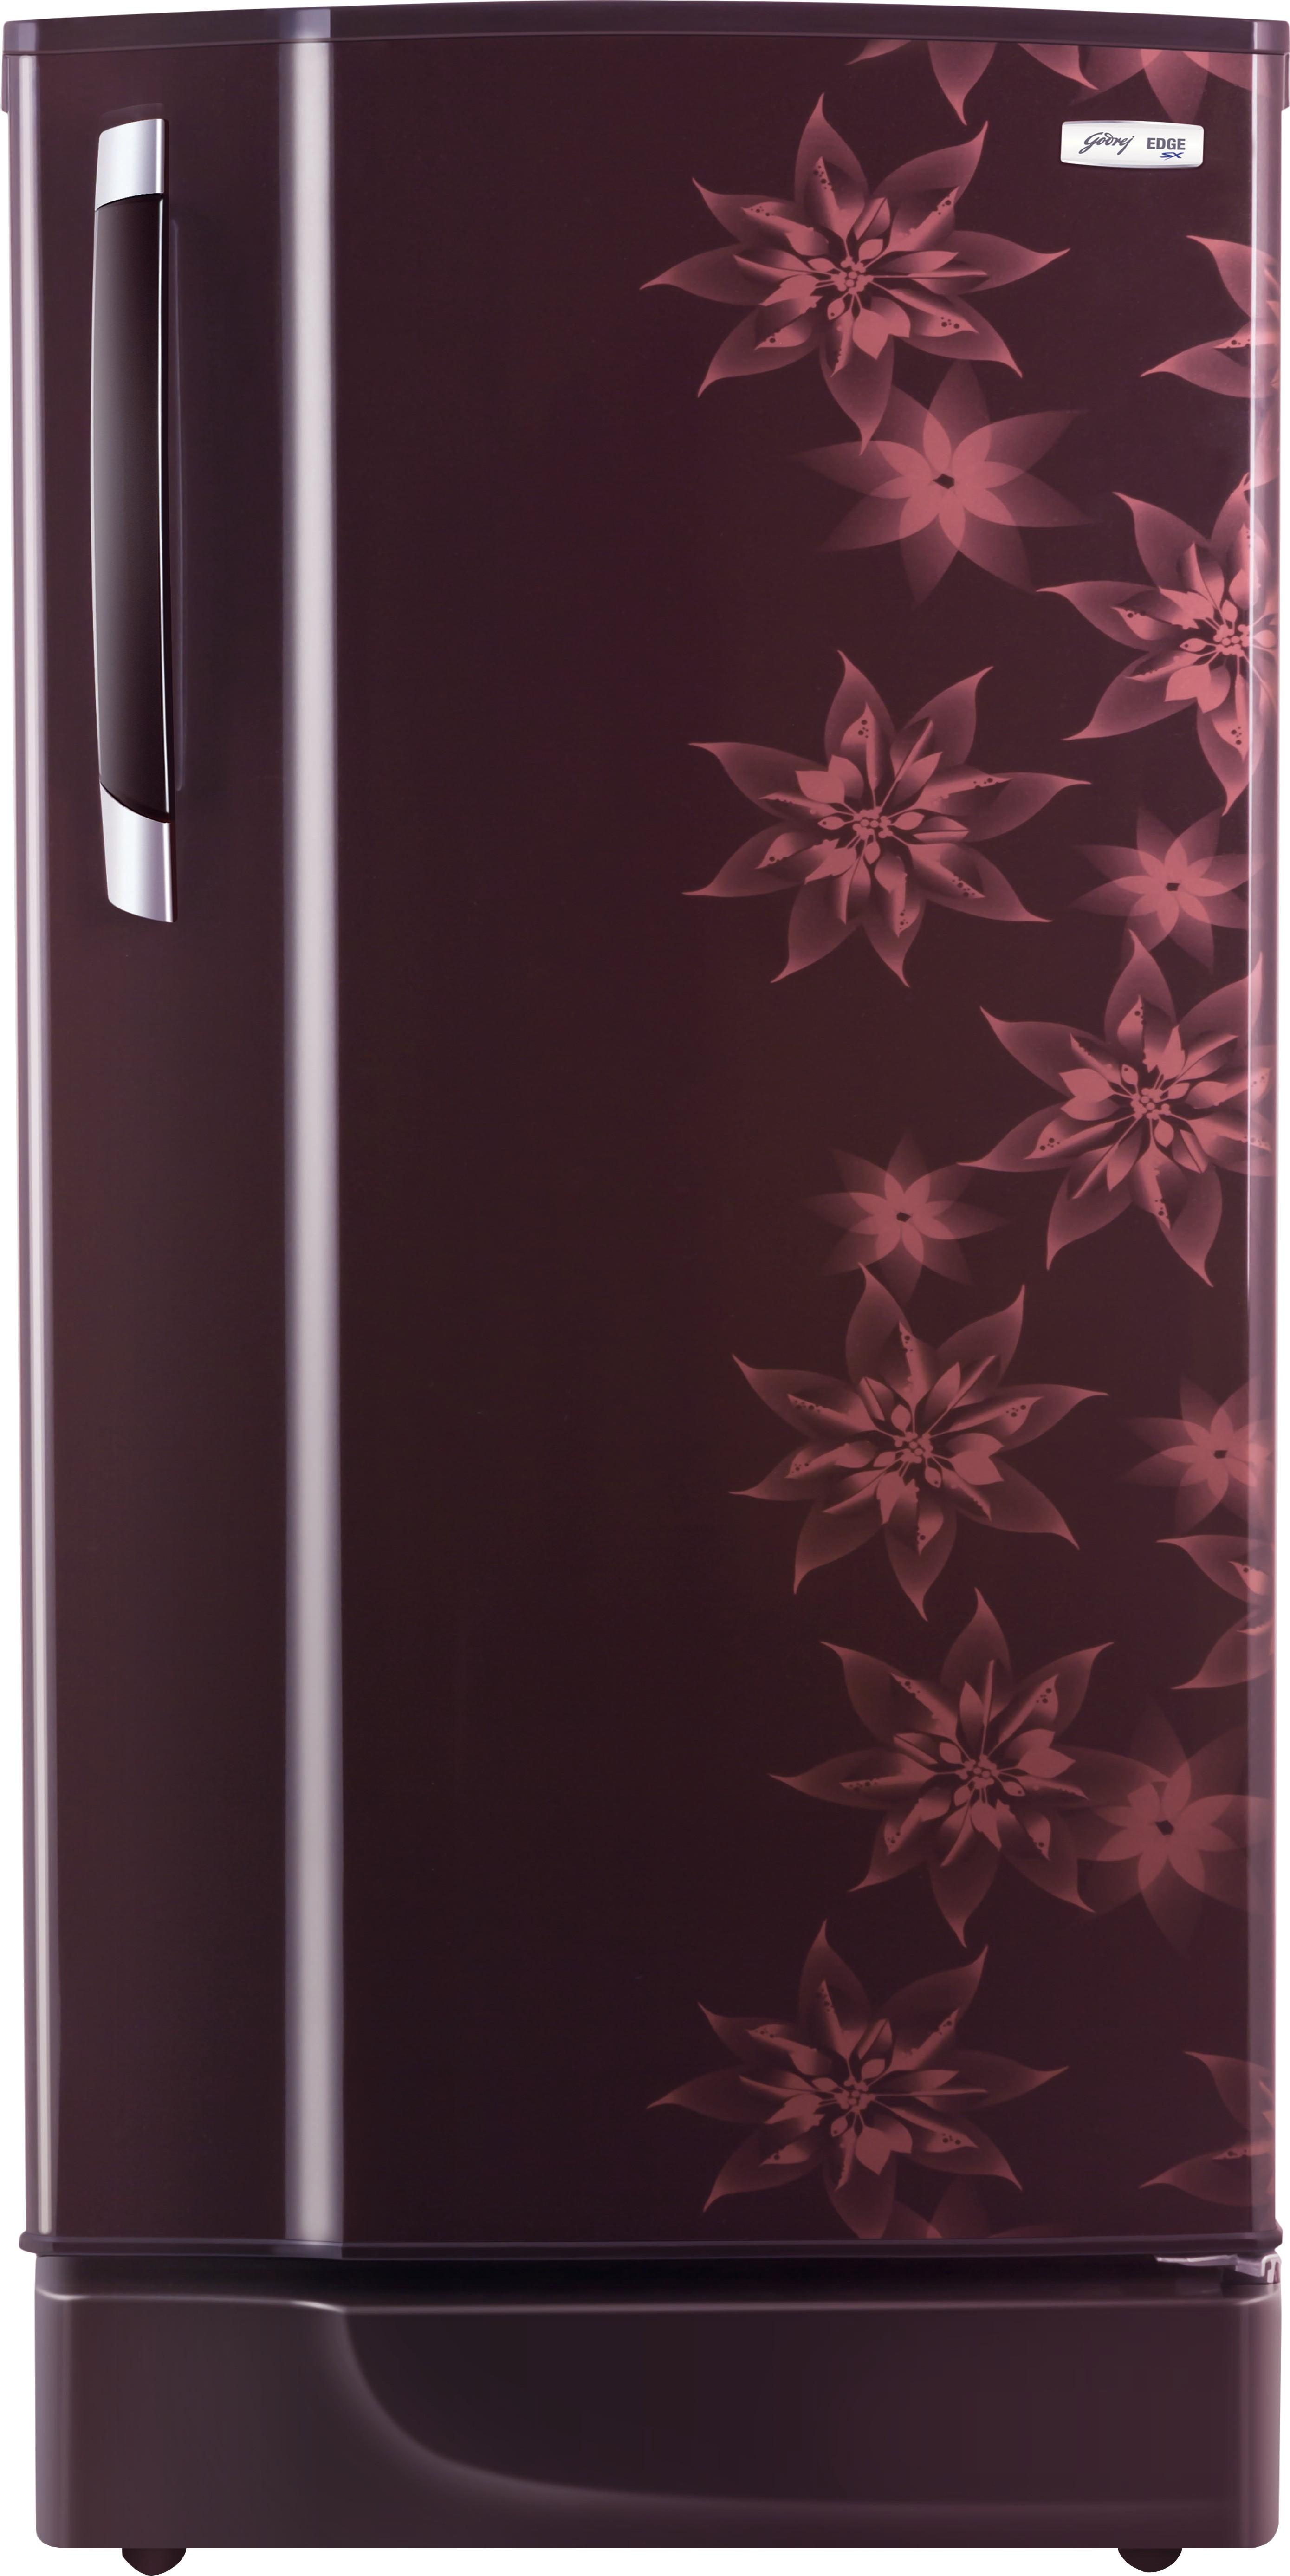 Godrej 185 L Direct Cool Single Door Refrigerator(RD Edge 185CHTM, Berry Bloom)